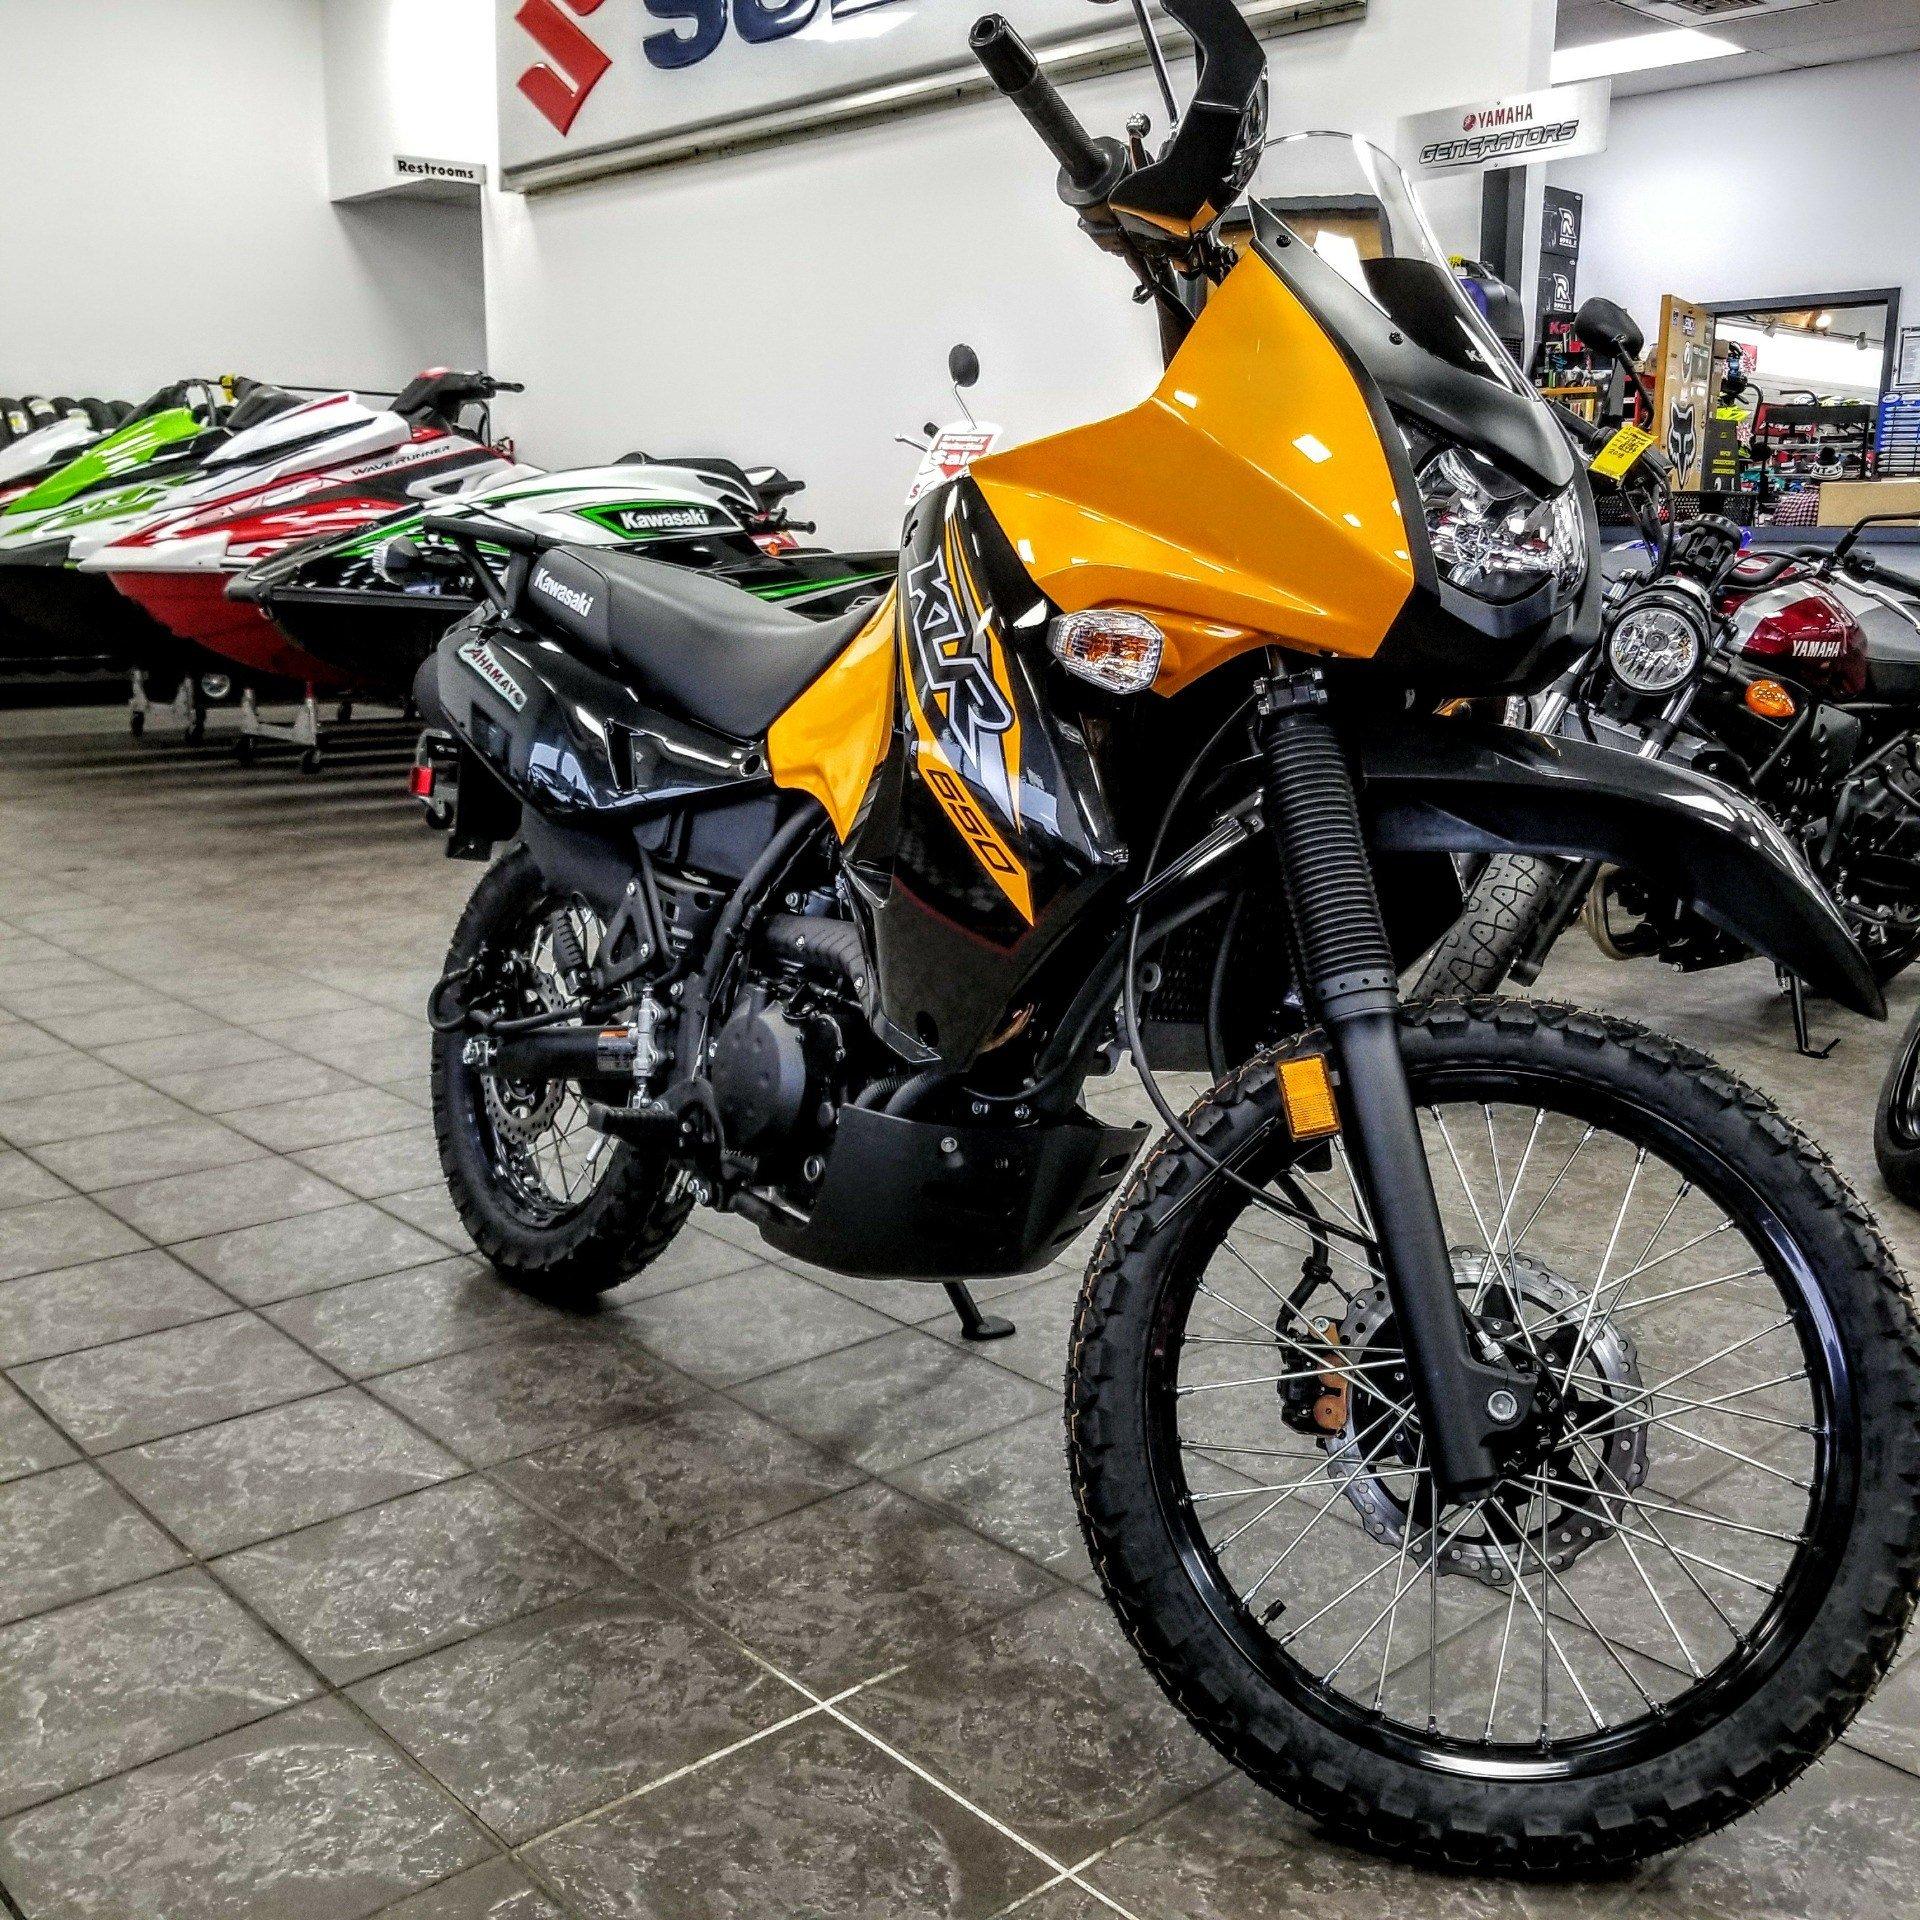 New 2018 Kawasaki KLR650 Motorcycles in Hickory, NC | Stock Number ...